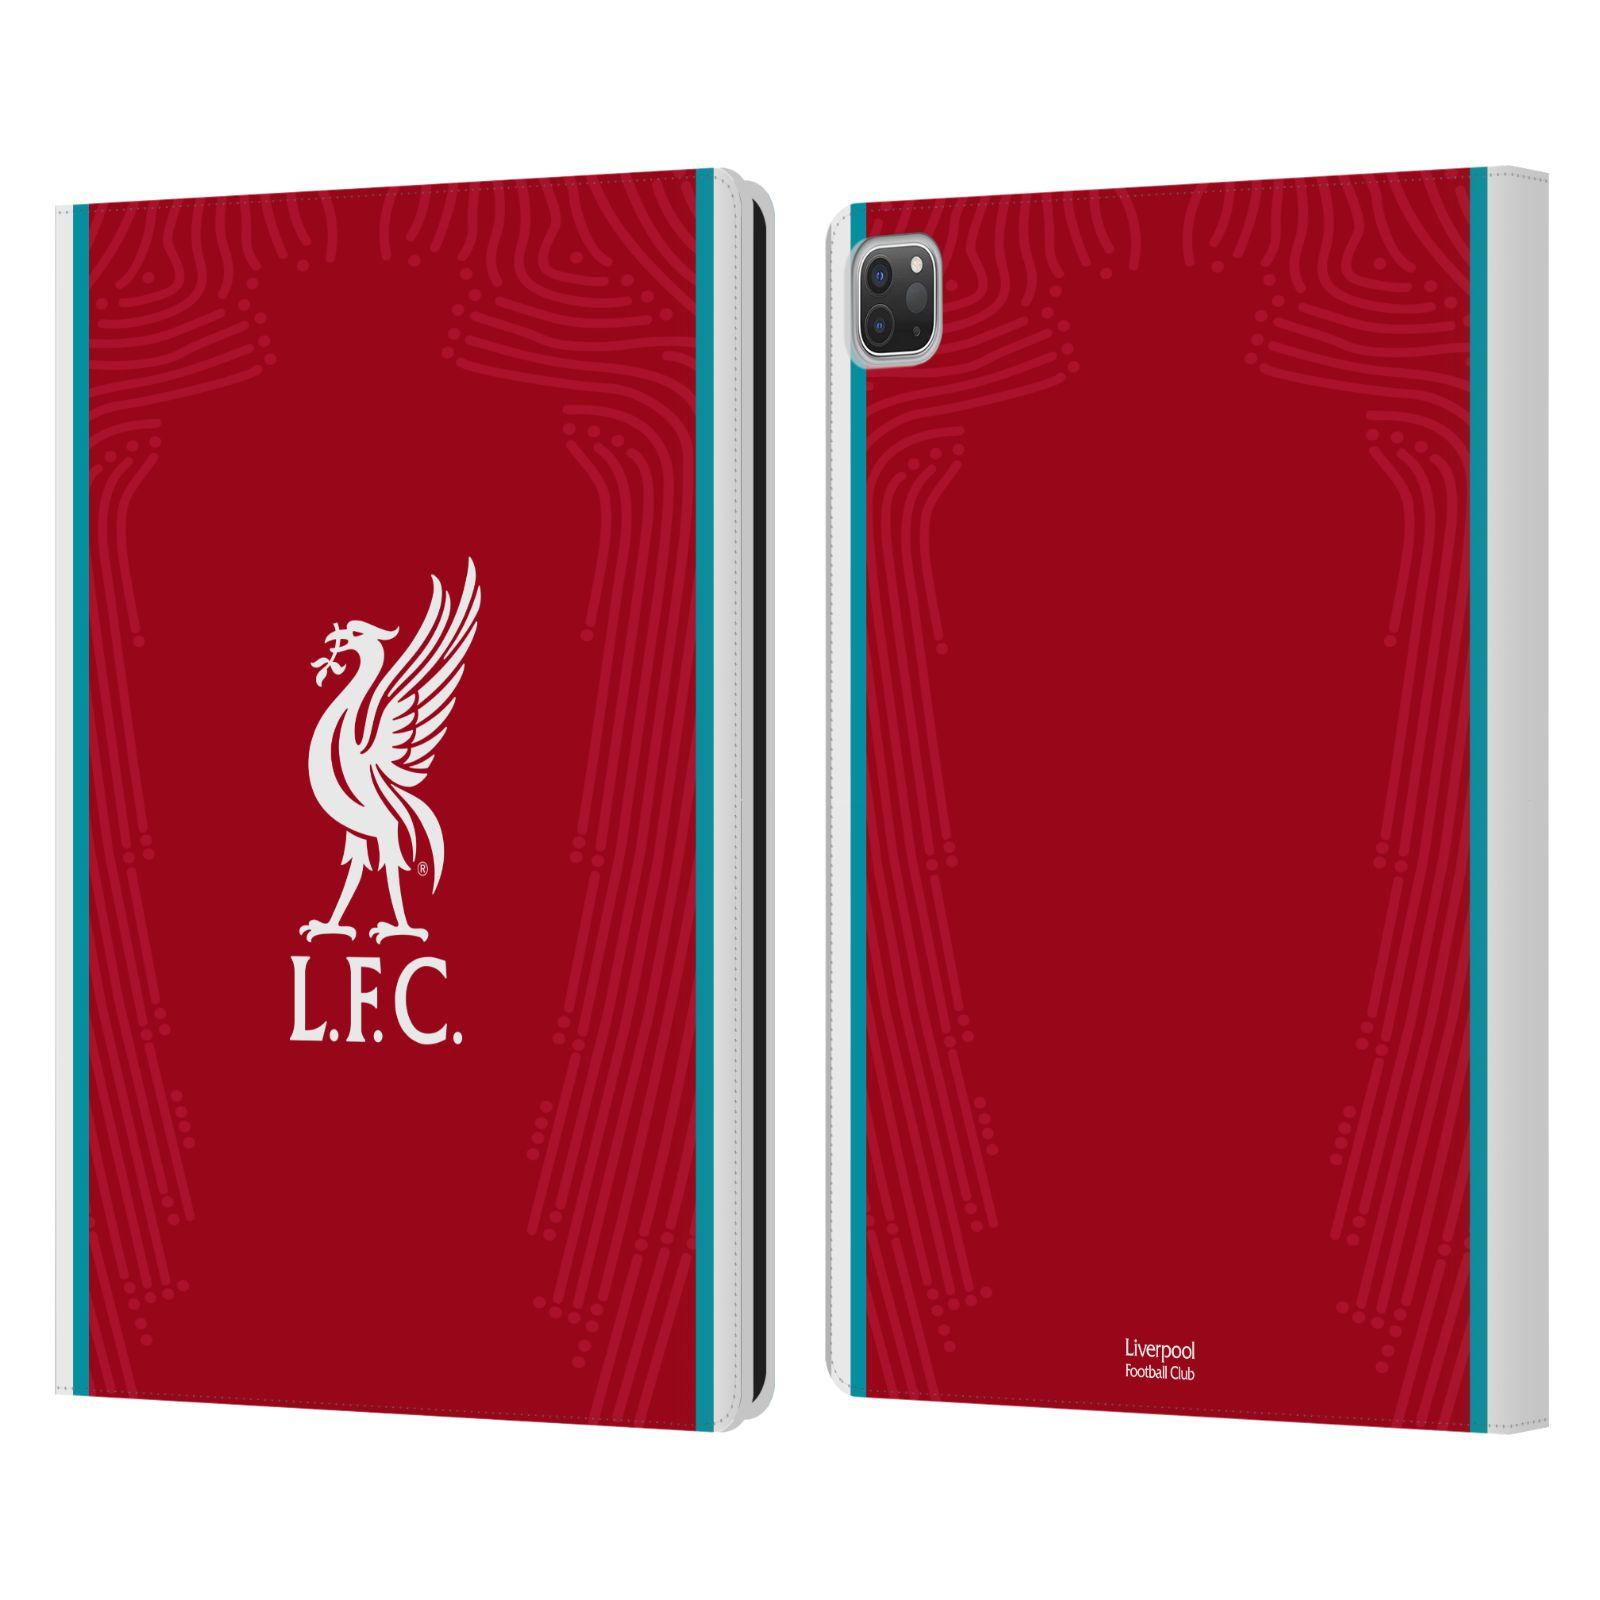 iPad 10.2 2019 2020 Air 2013 2 上品 2014 mini 1 3 卓出 4 レザー手帳型ウォレットタイプケース Apple 21 Club 2018 Pro Pr オフィシャル 11 Football Liverpool